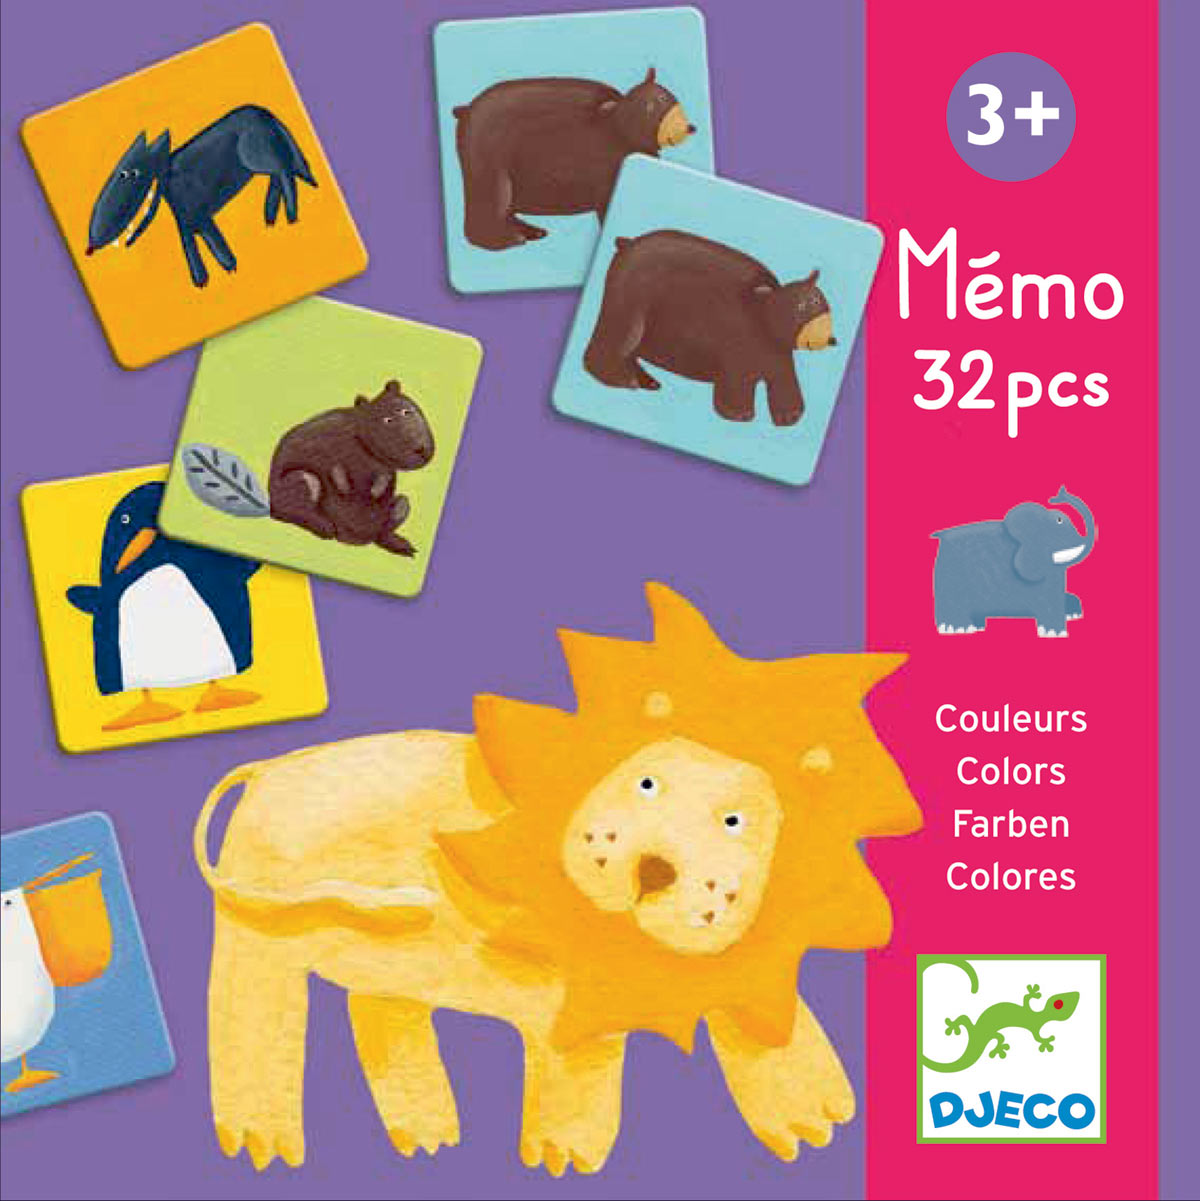 Memo - Colour animals